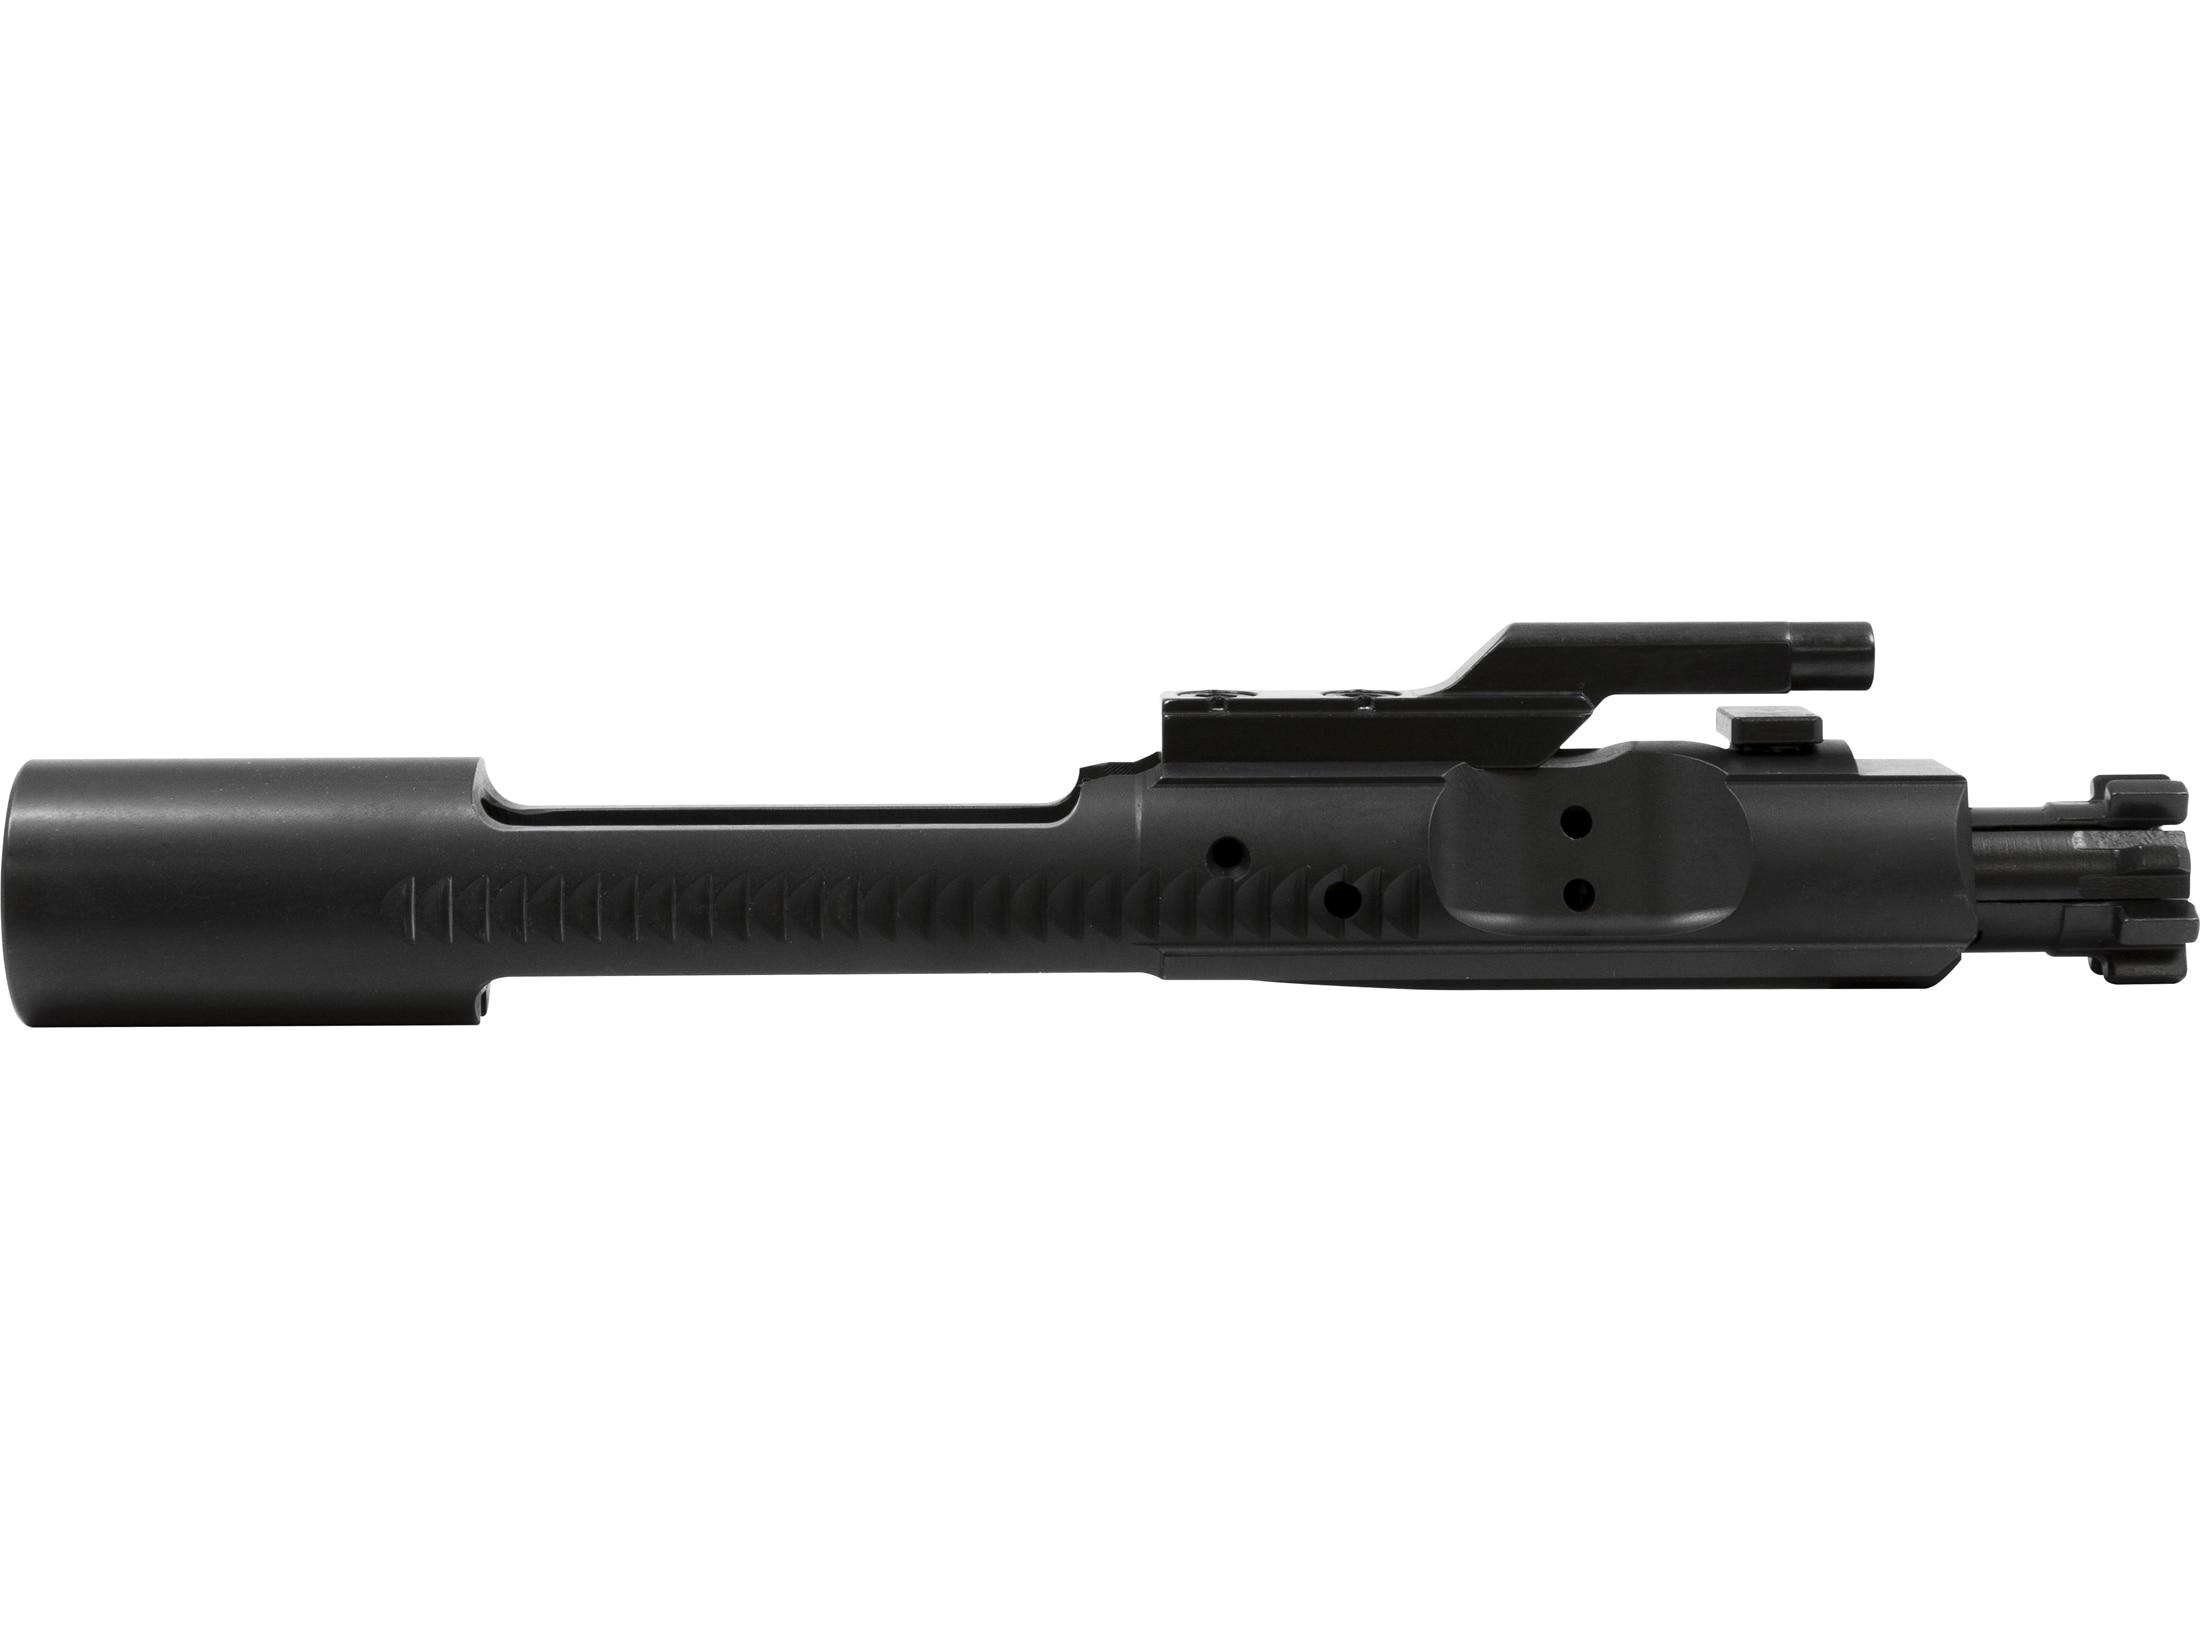 AR-STONER Bolt Carrier Group AR-15 450 Bushmaster 458 SOCOM Nitride